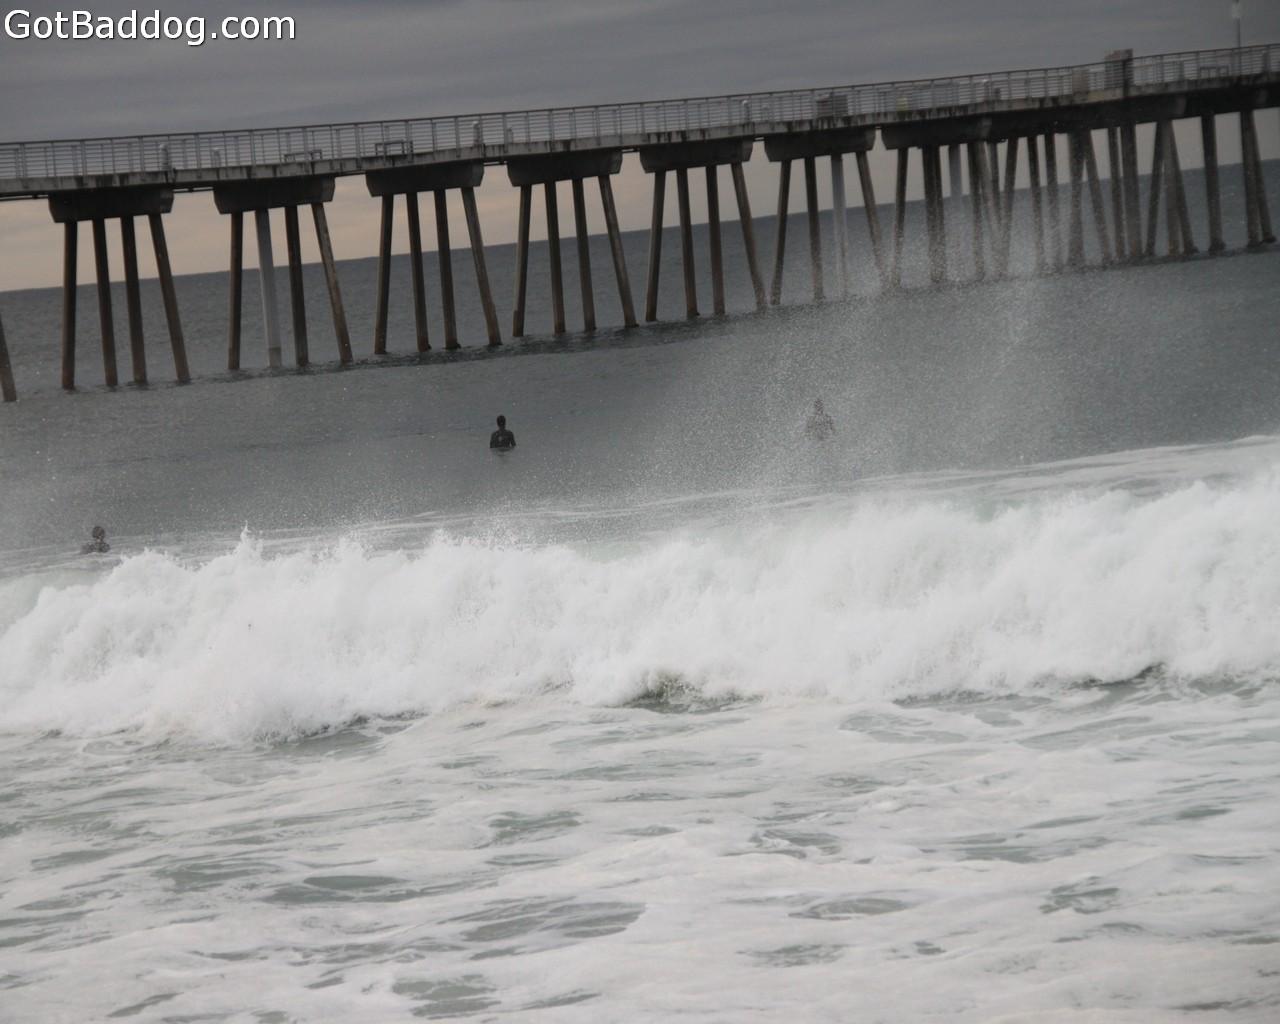 surf_1068